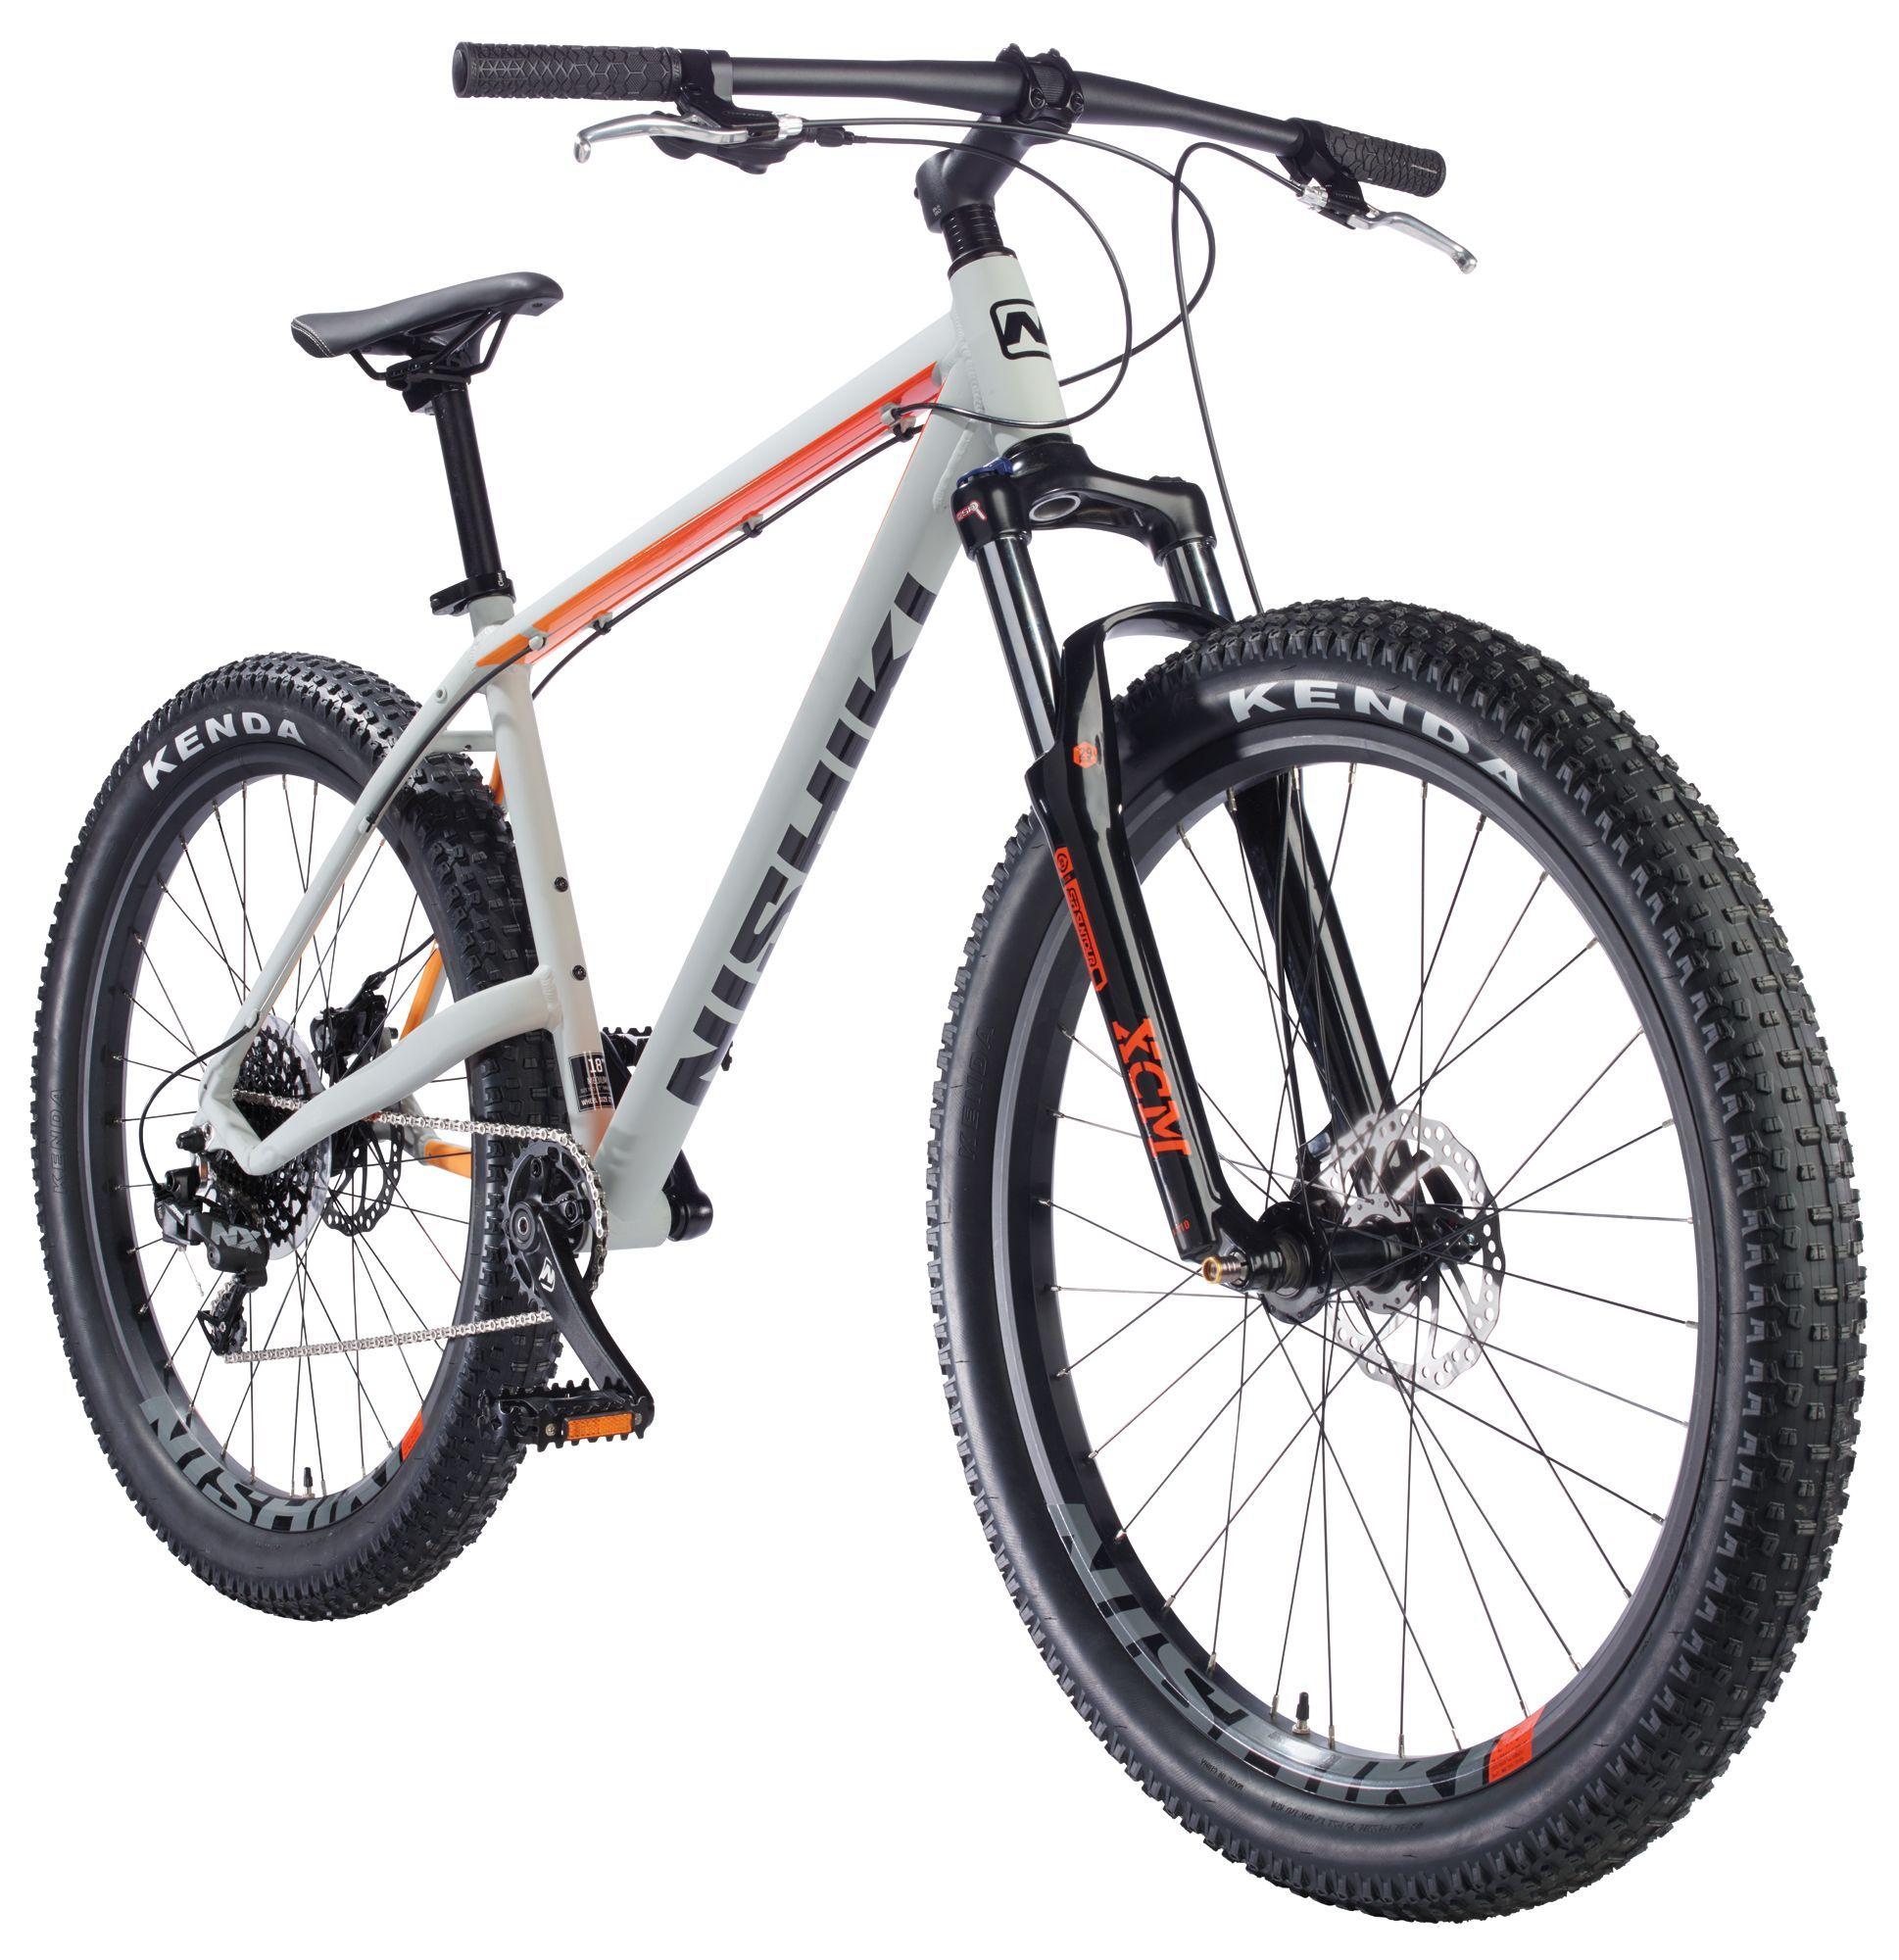 Nishiki Men S Colorado Comp 1x 27 5 Mountain Bike In